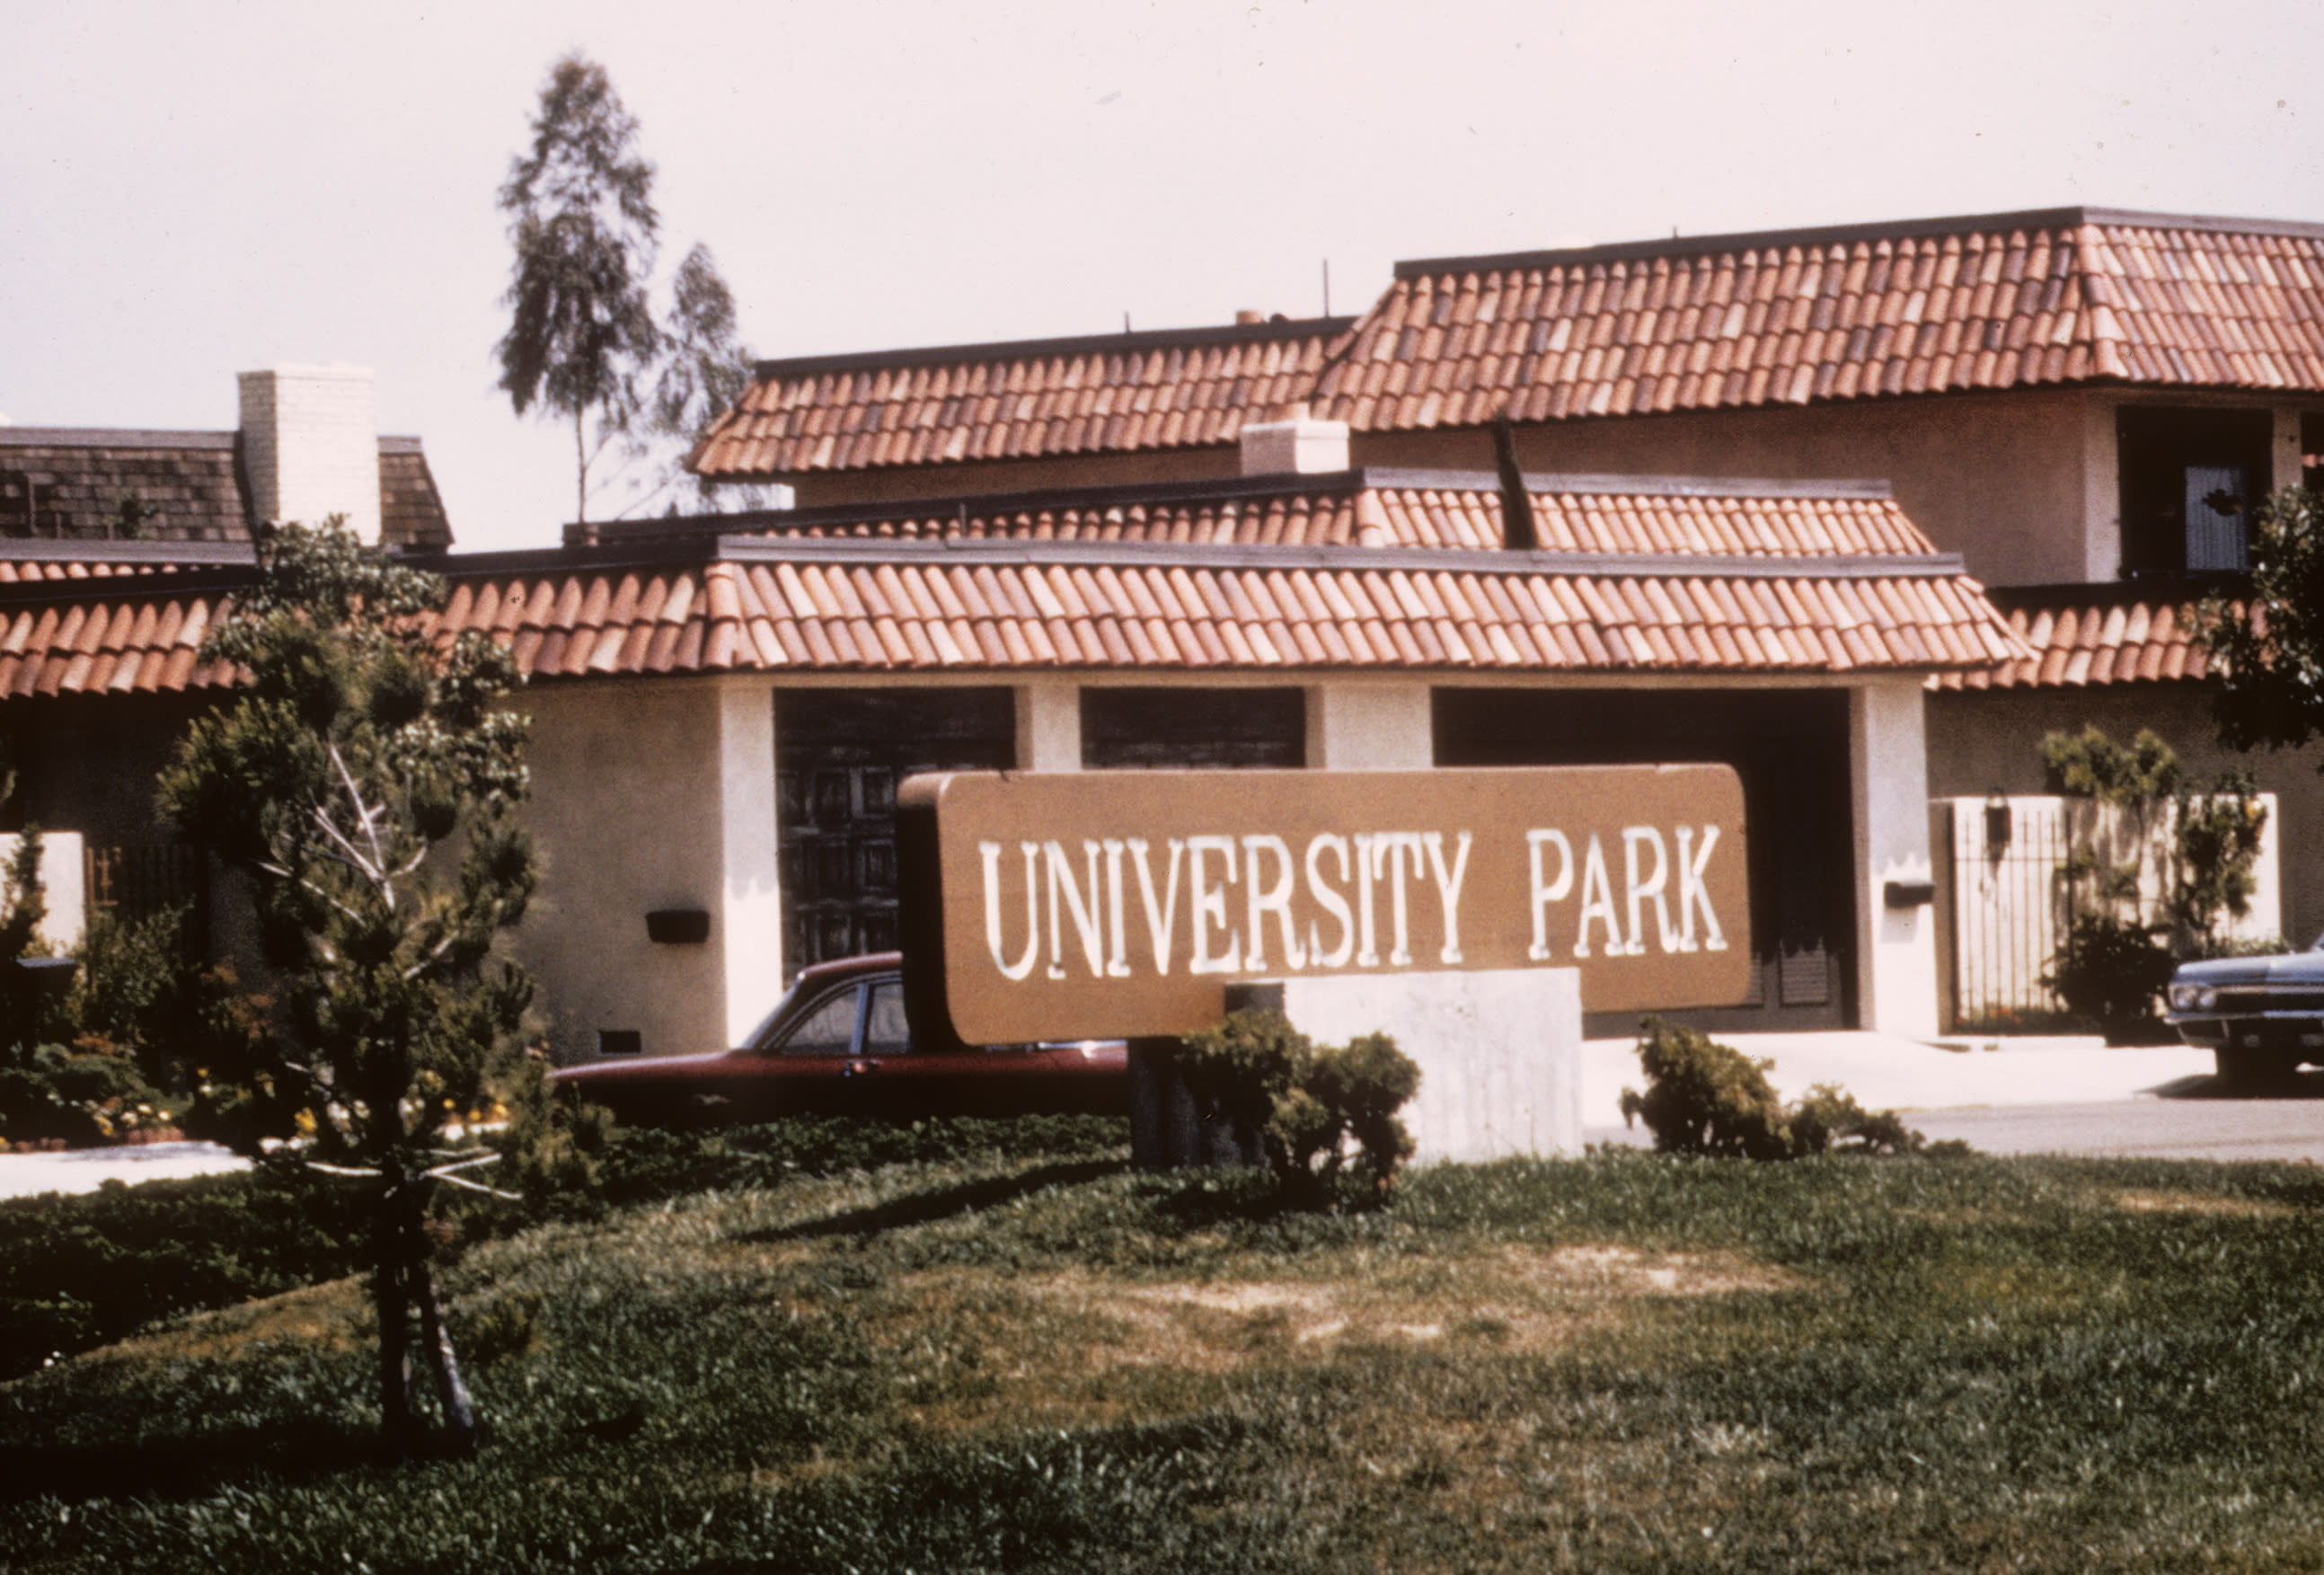 University Place Village in Irvine